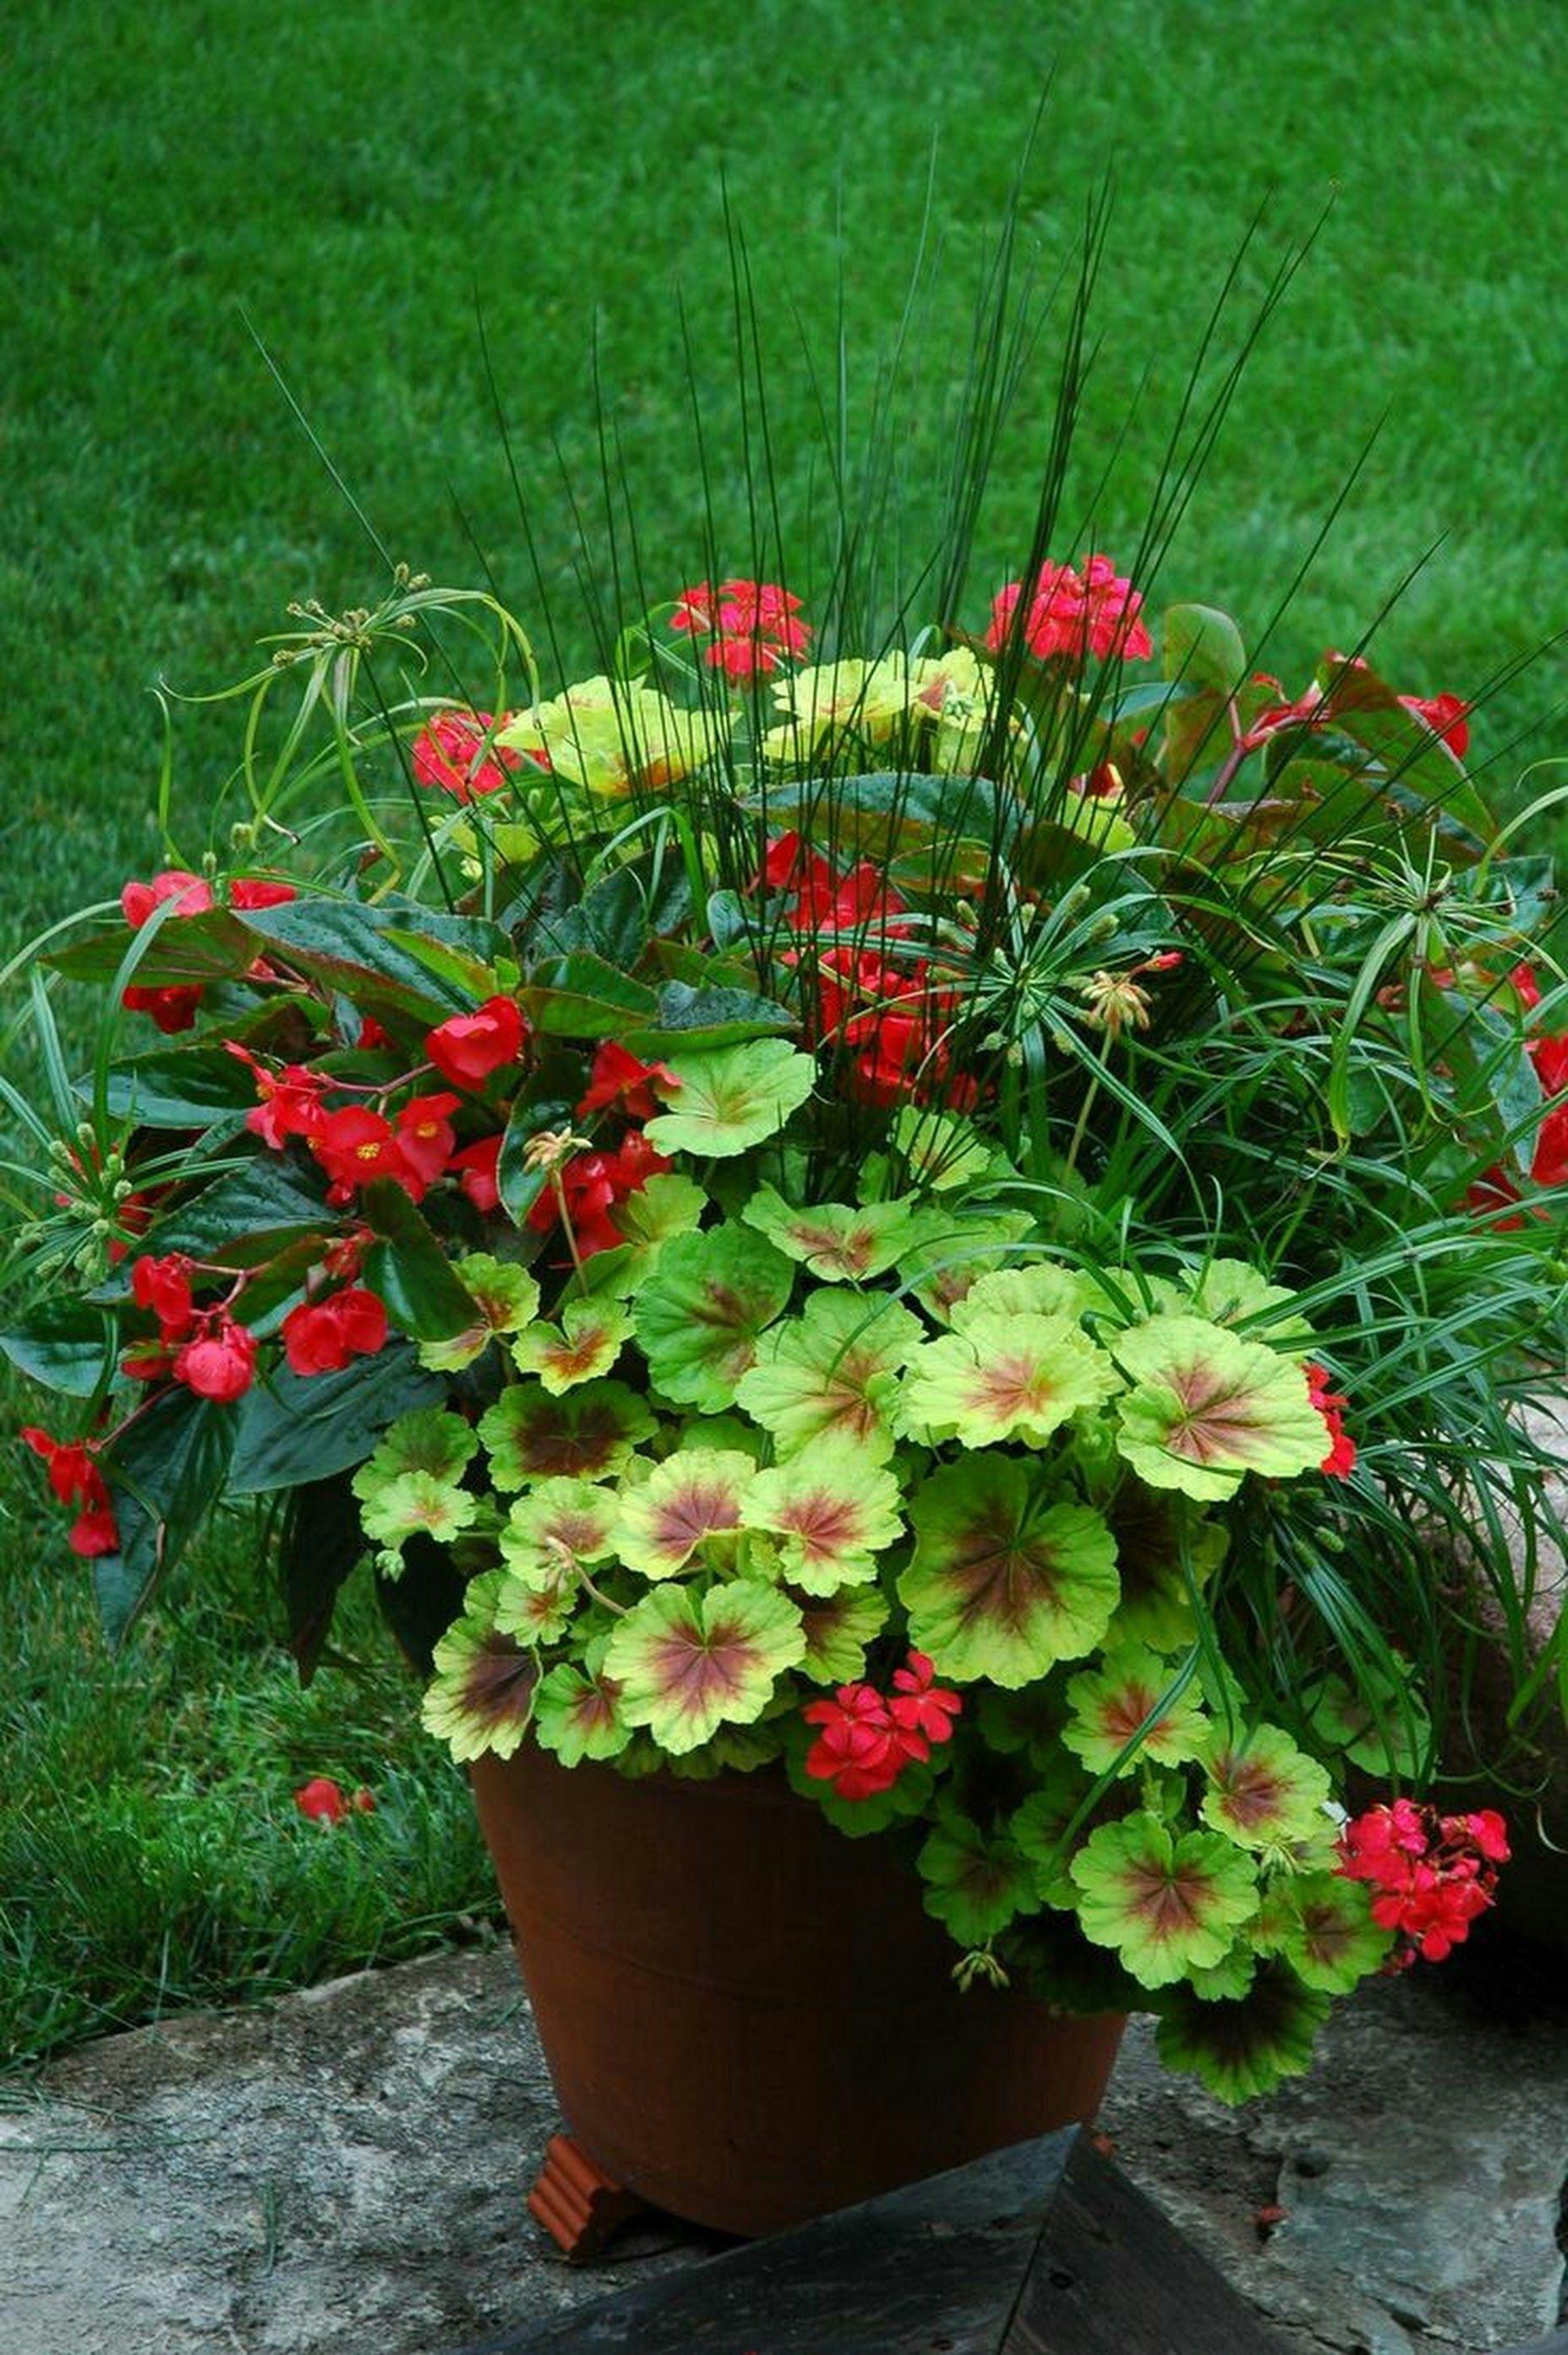 Nascimento Ferreira 화분 꽃, 식물, 화분 키우기